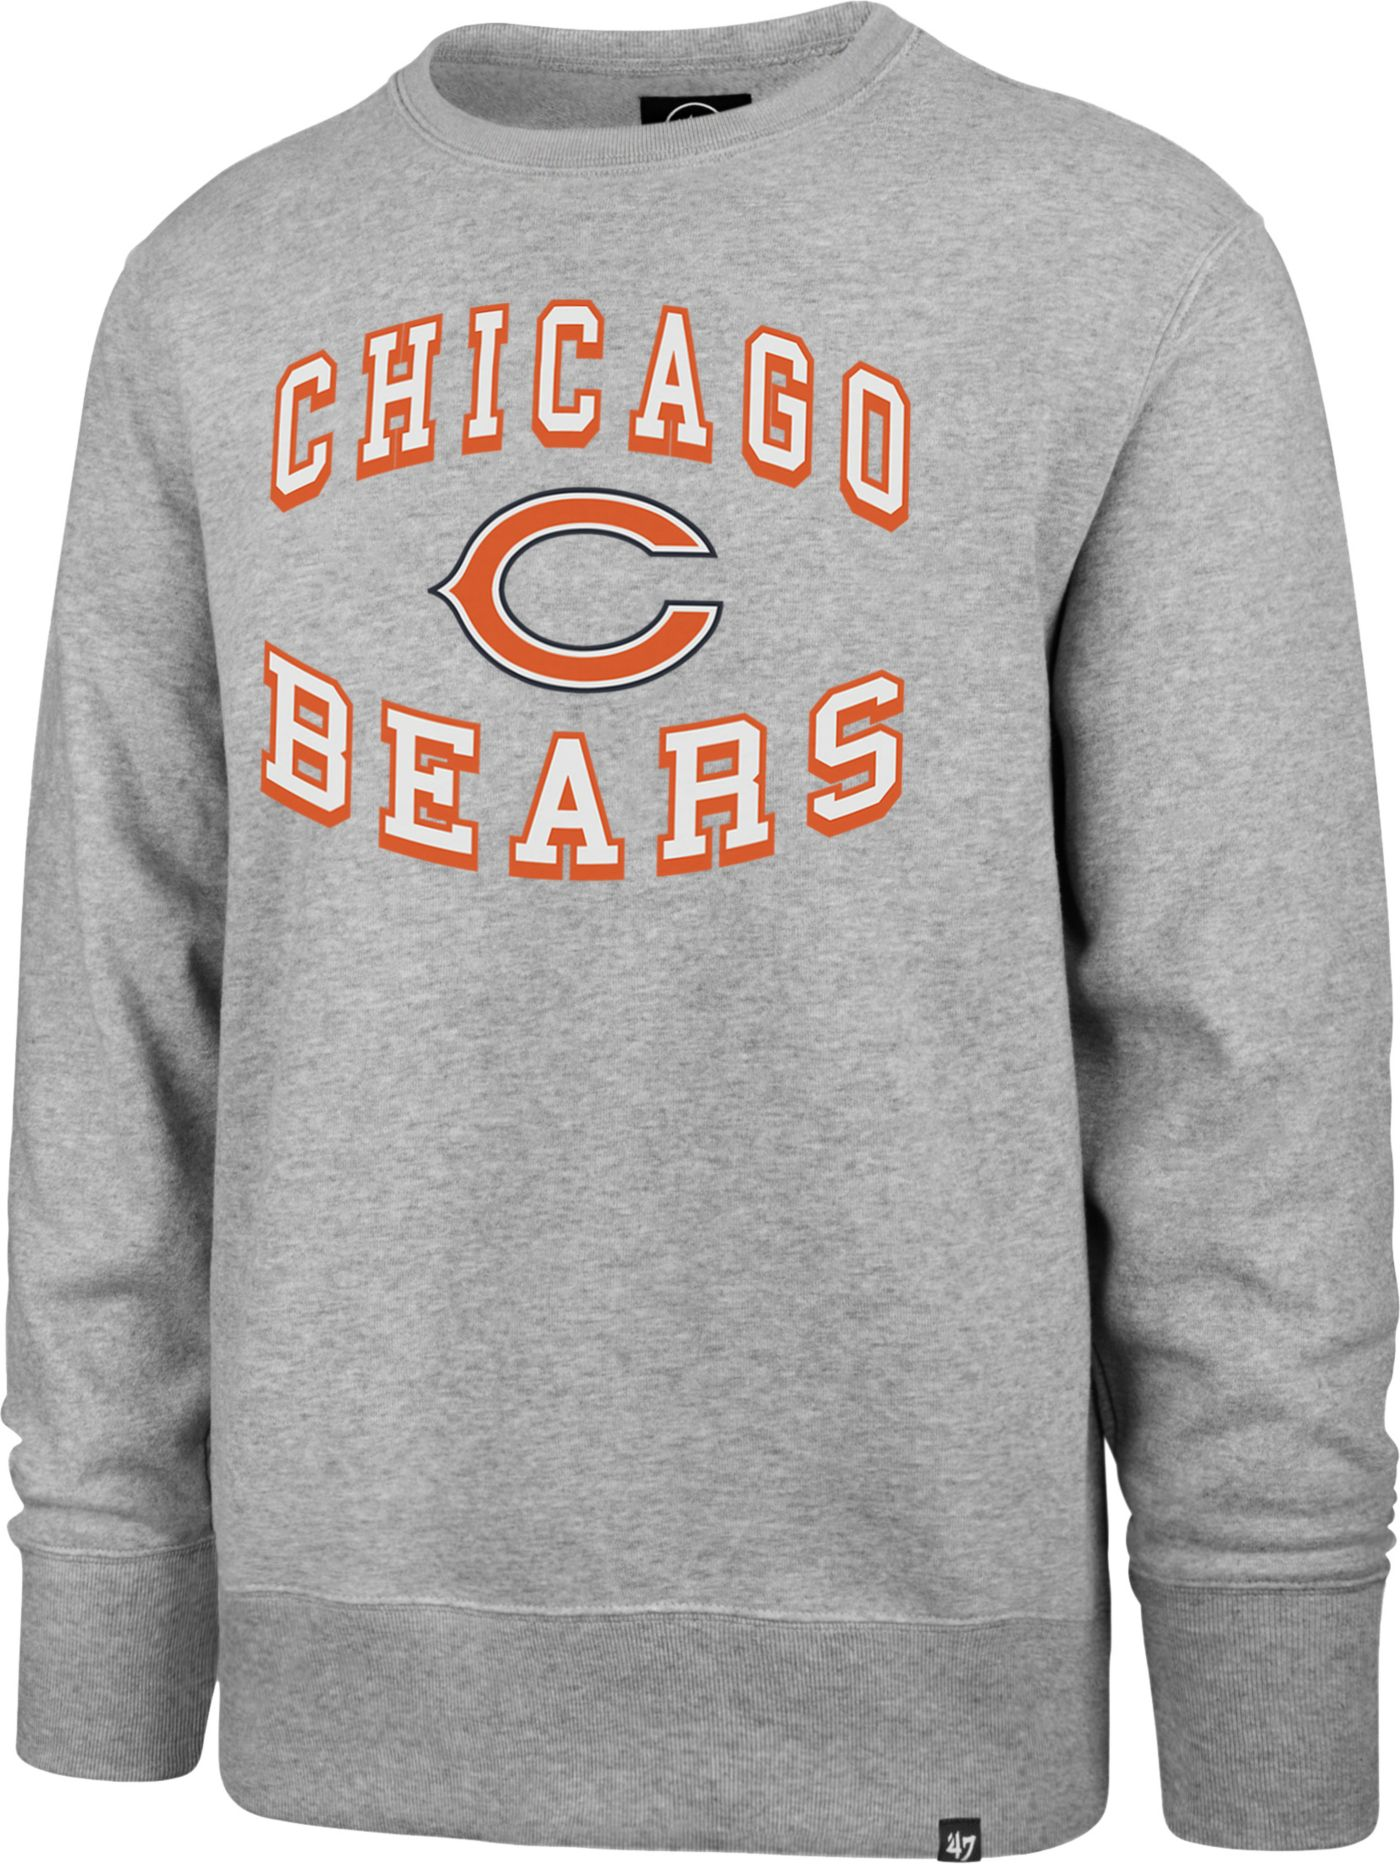 '47 Men's Chicago Bears Headline Grey Crew